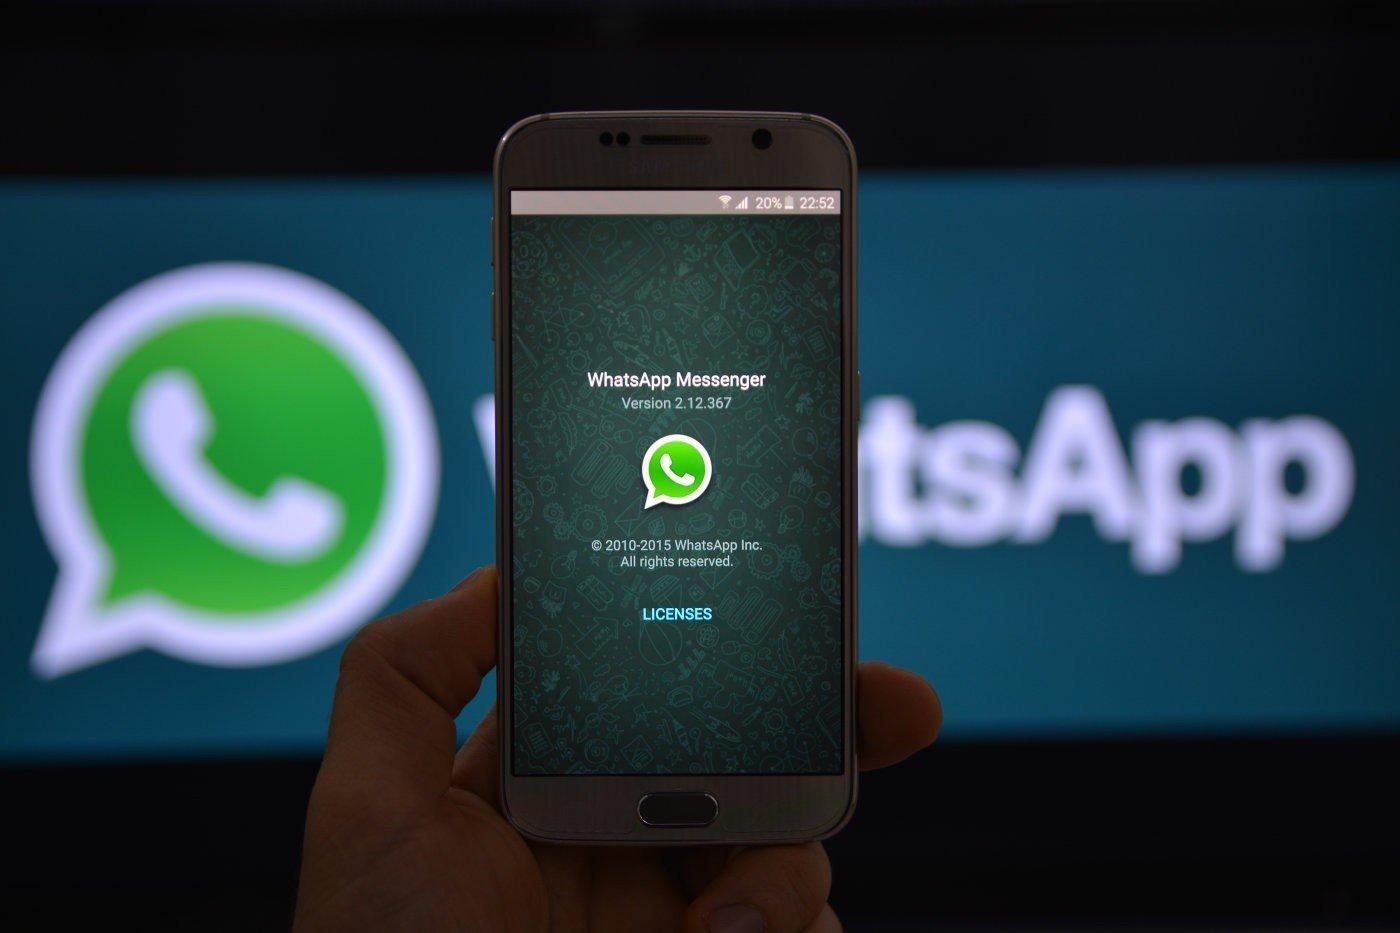 whatsapp-destegini-hangi-telefonlardan-ne-zaman-cekecek-2